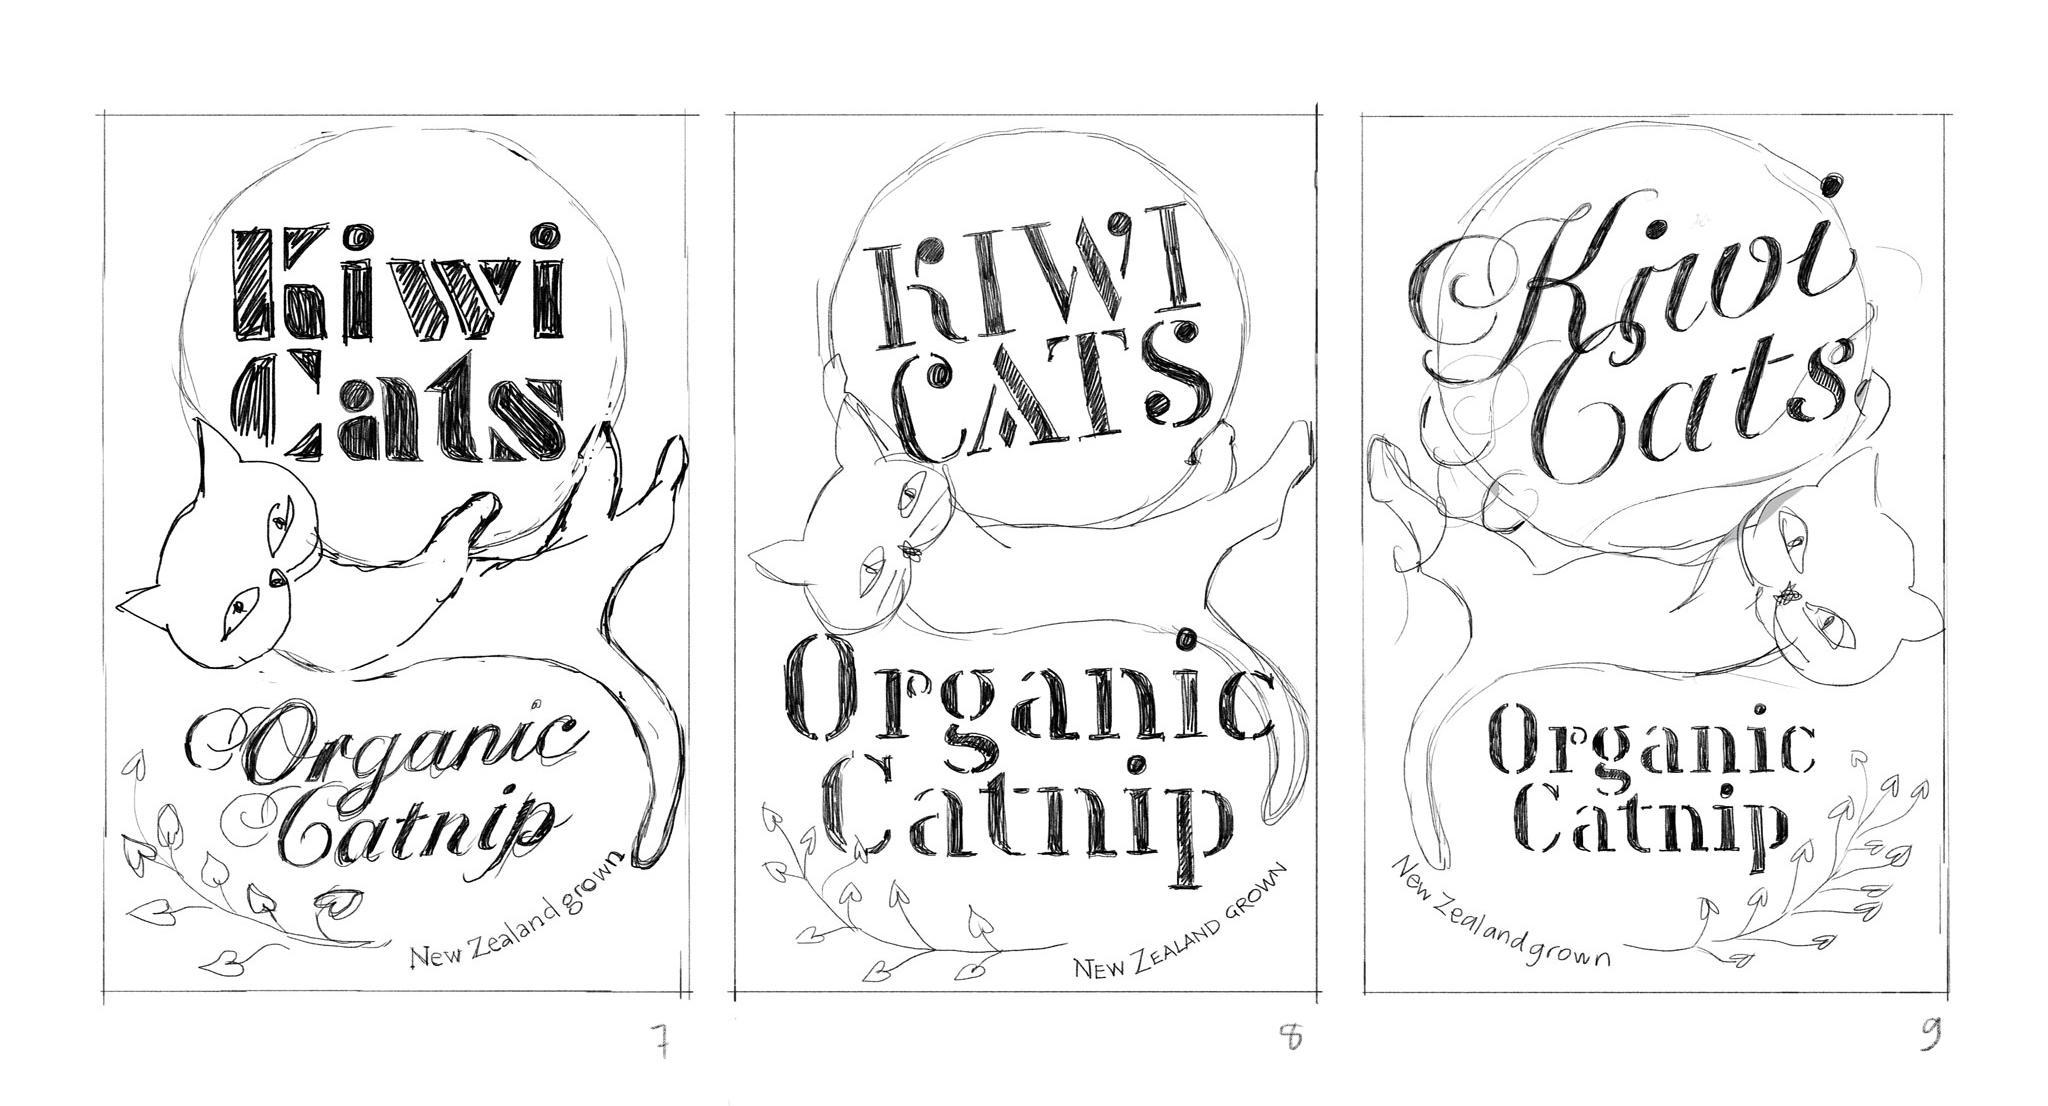 Organic Catnip Label - image 8 - student project